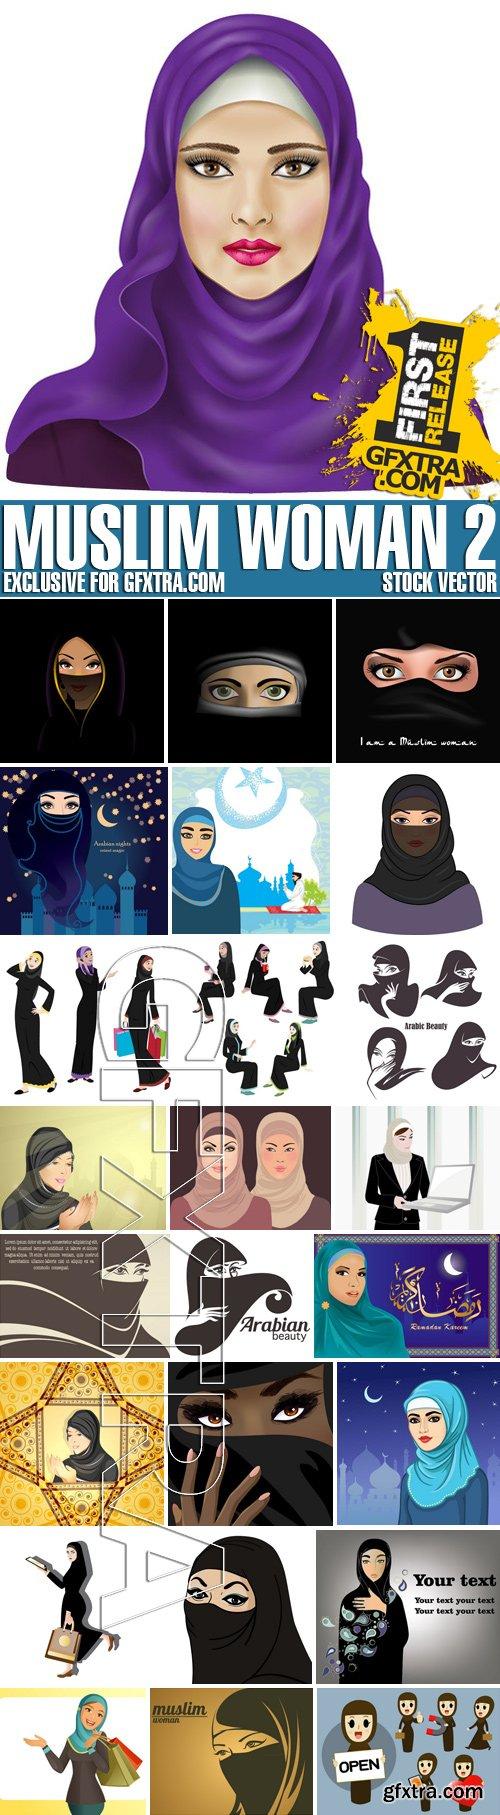 Stock Vectors - Muslim woman 2, 25xEPS